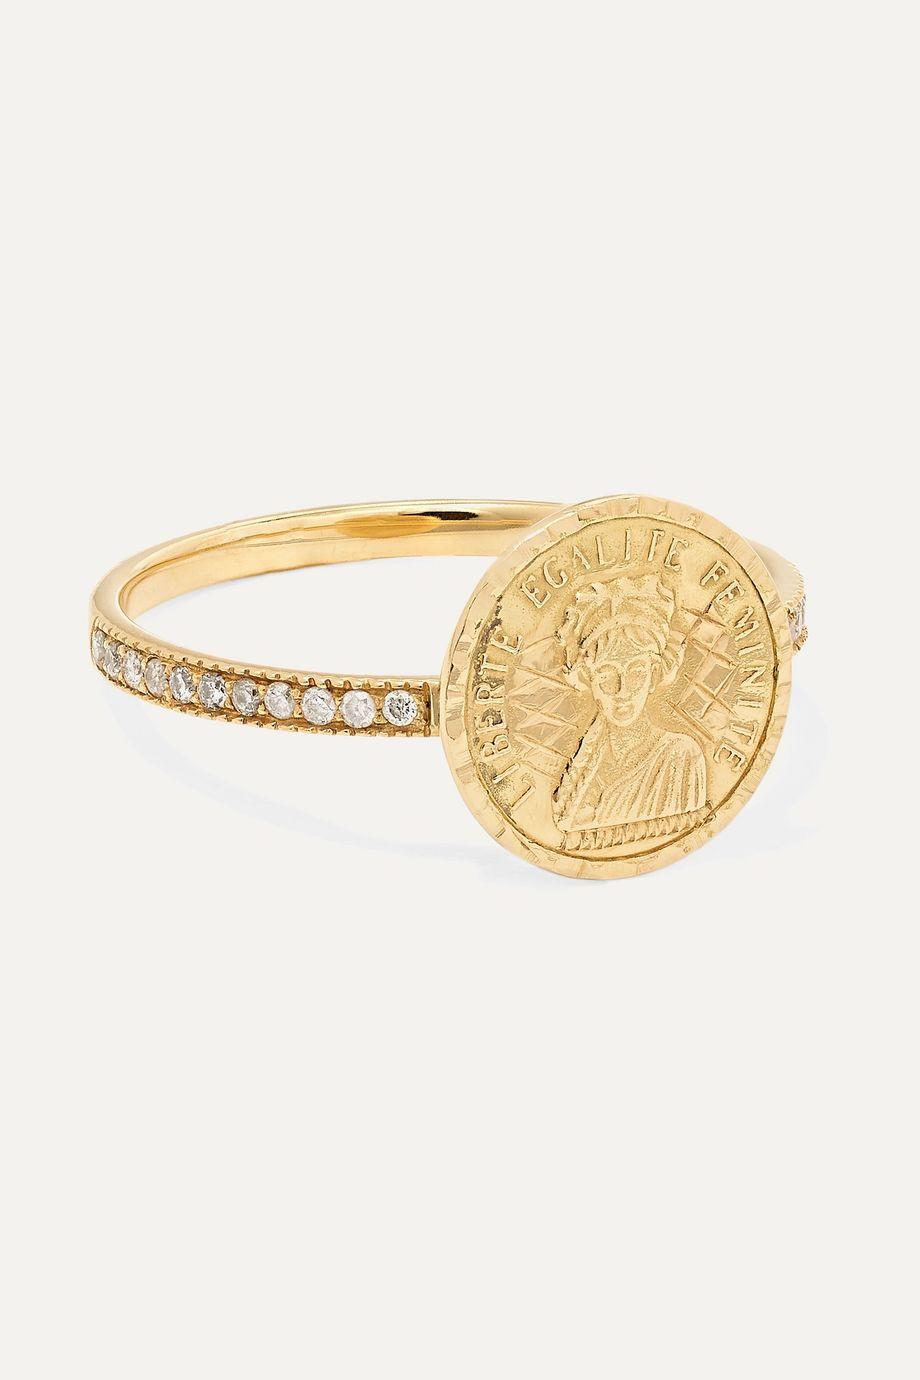 Anissa Kermiche Louise D'Or Pavé 18-karat gold diamond ring